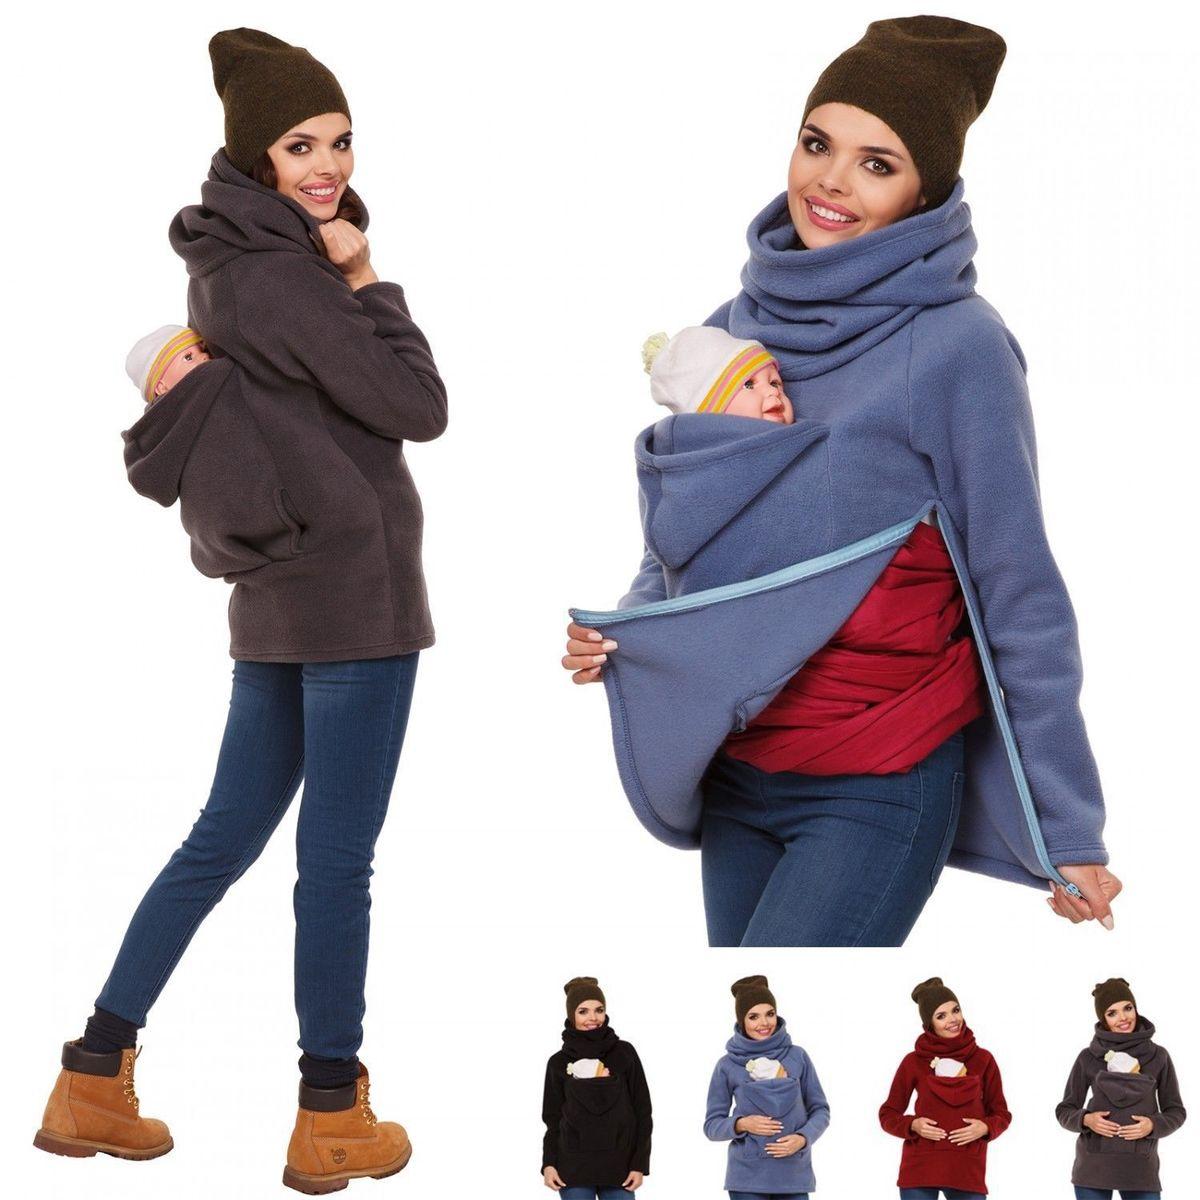 Premama Baby Carrier Maternity Top Autumn Winter Coat Pregnancy Clothes Mummy Kangaroo Sweater Loose Coat S/M/L/XL/2XL 3 Colors